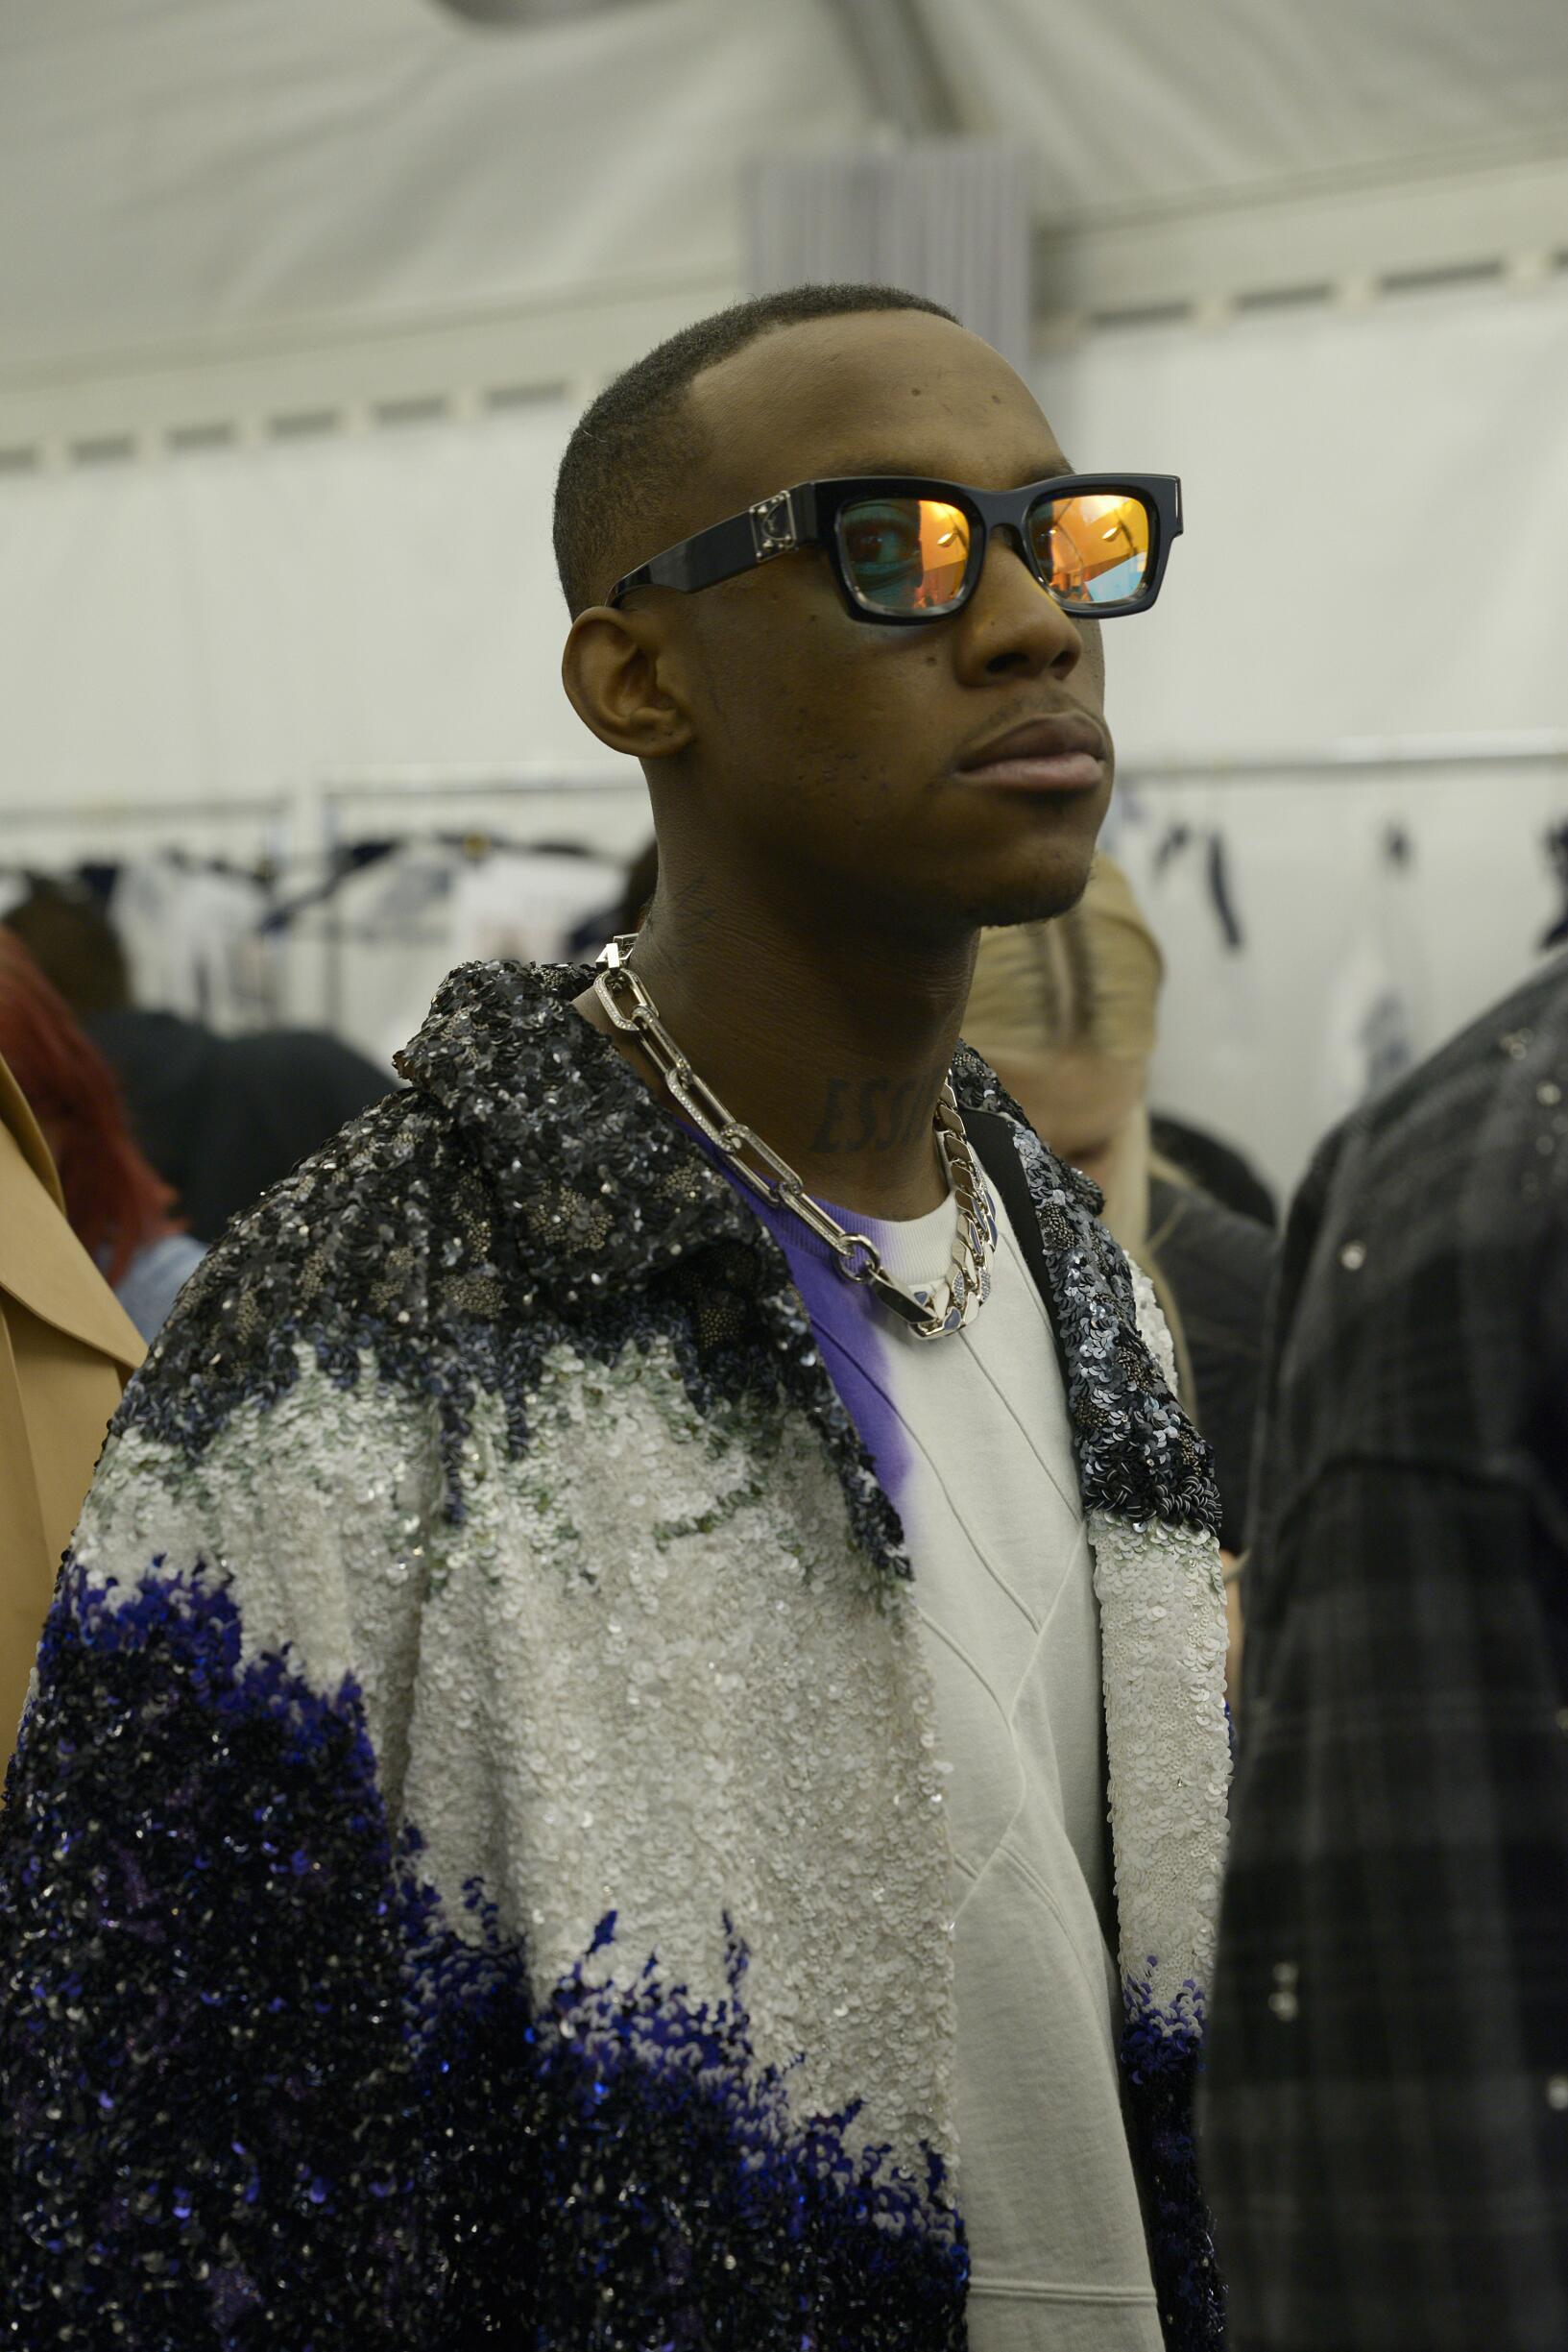 Backstage Louis Vuitton Model Fall Winter 2019